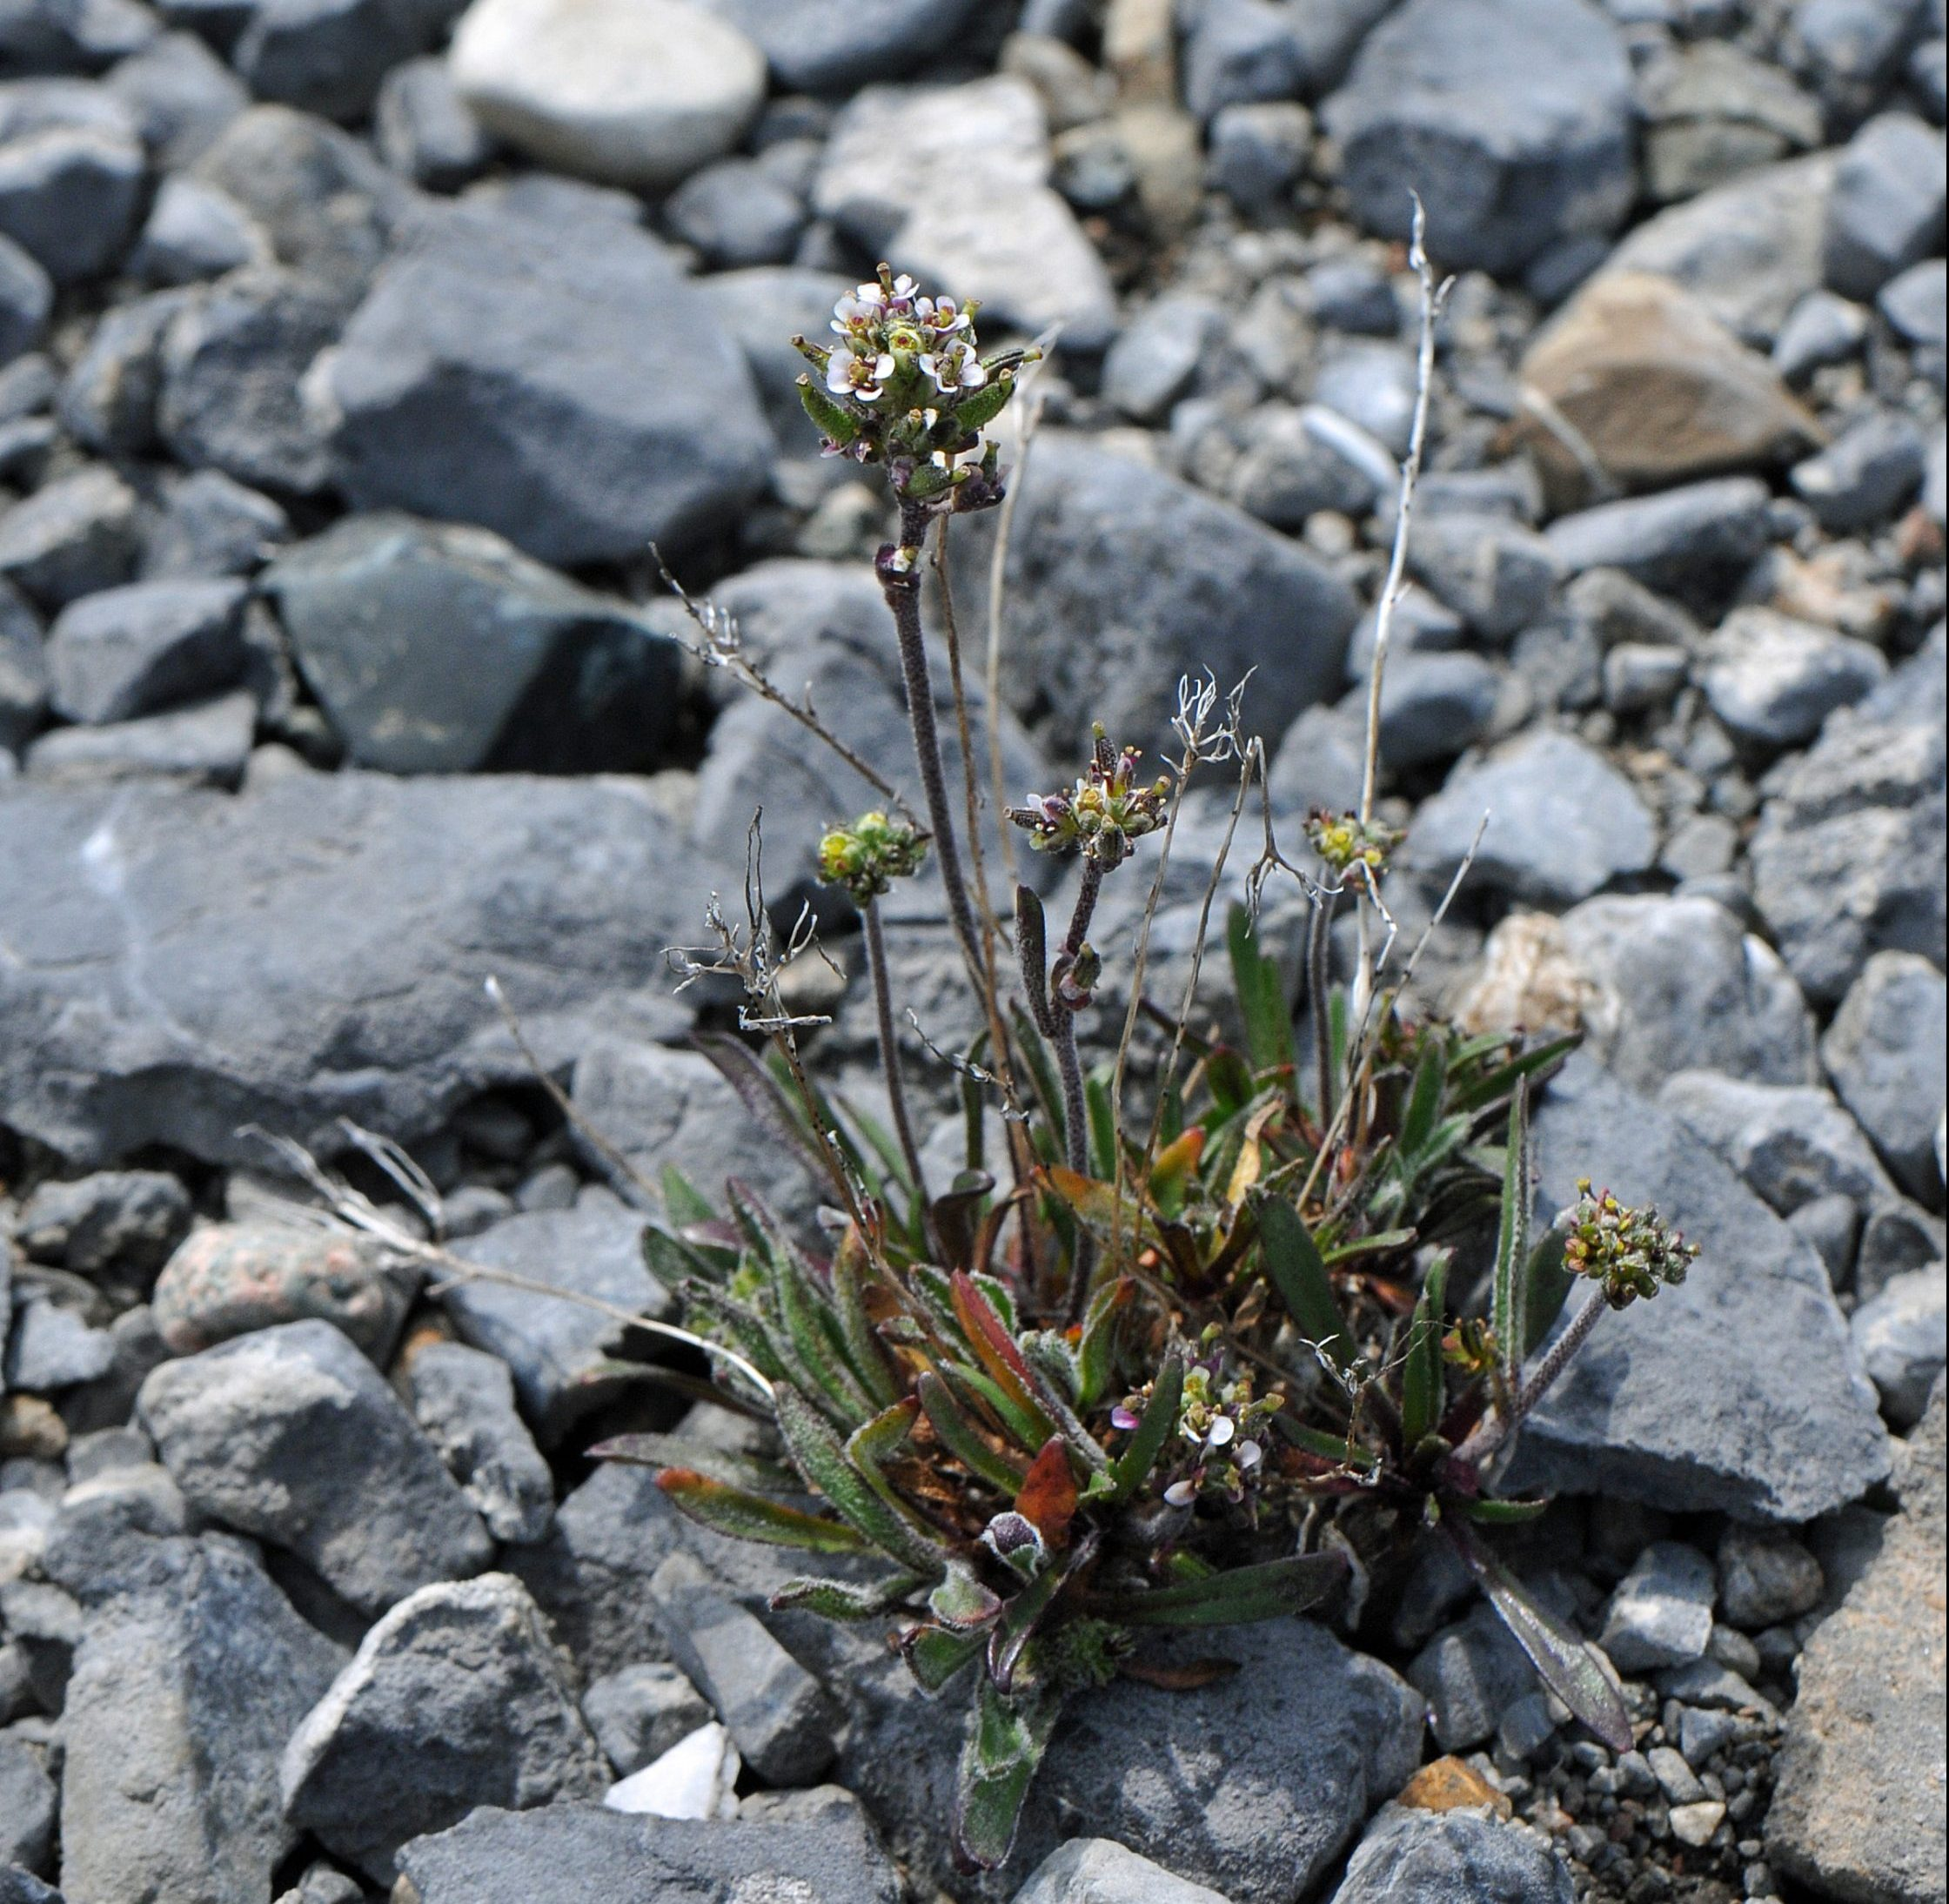 Image of Fernald's rockcress (Braya fernaldii).